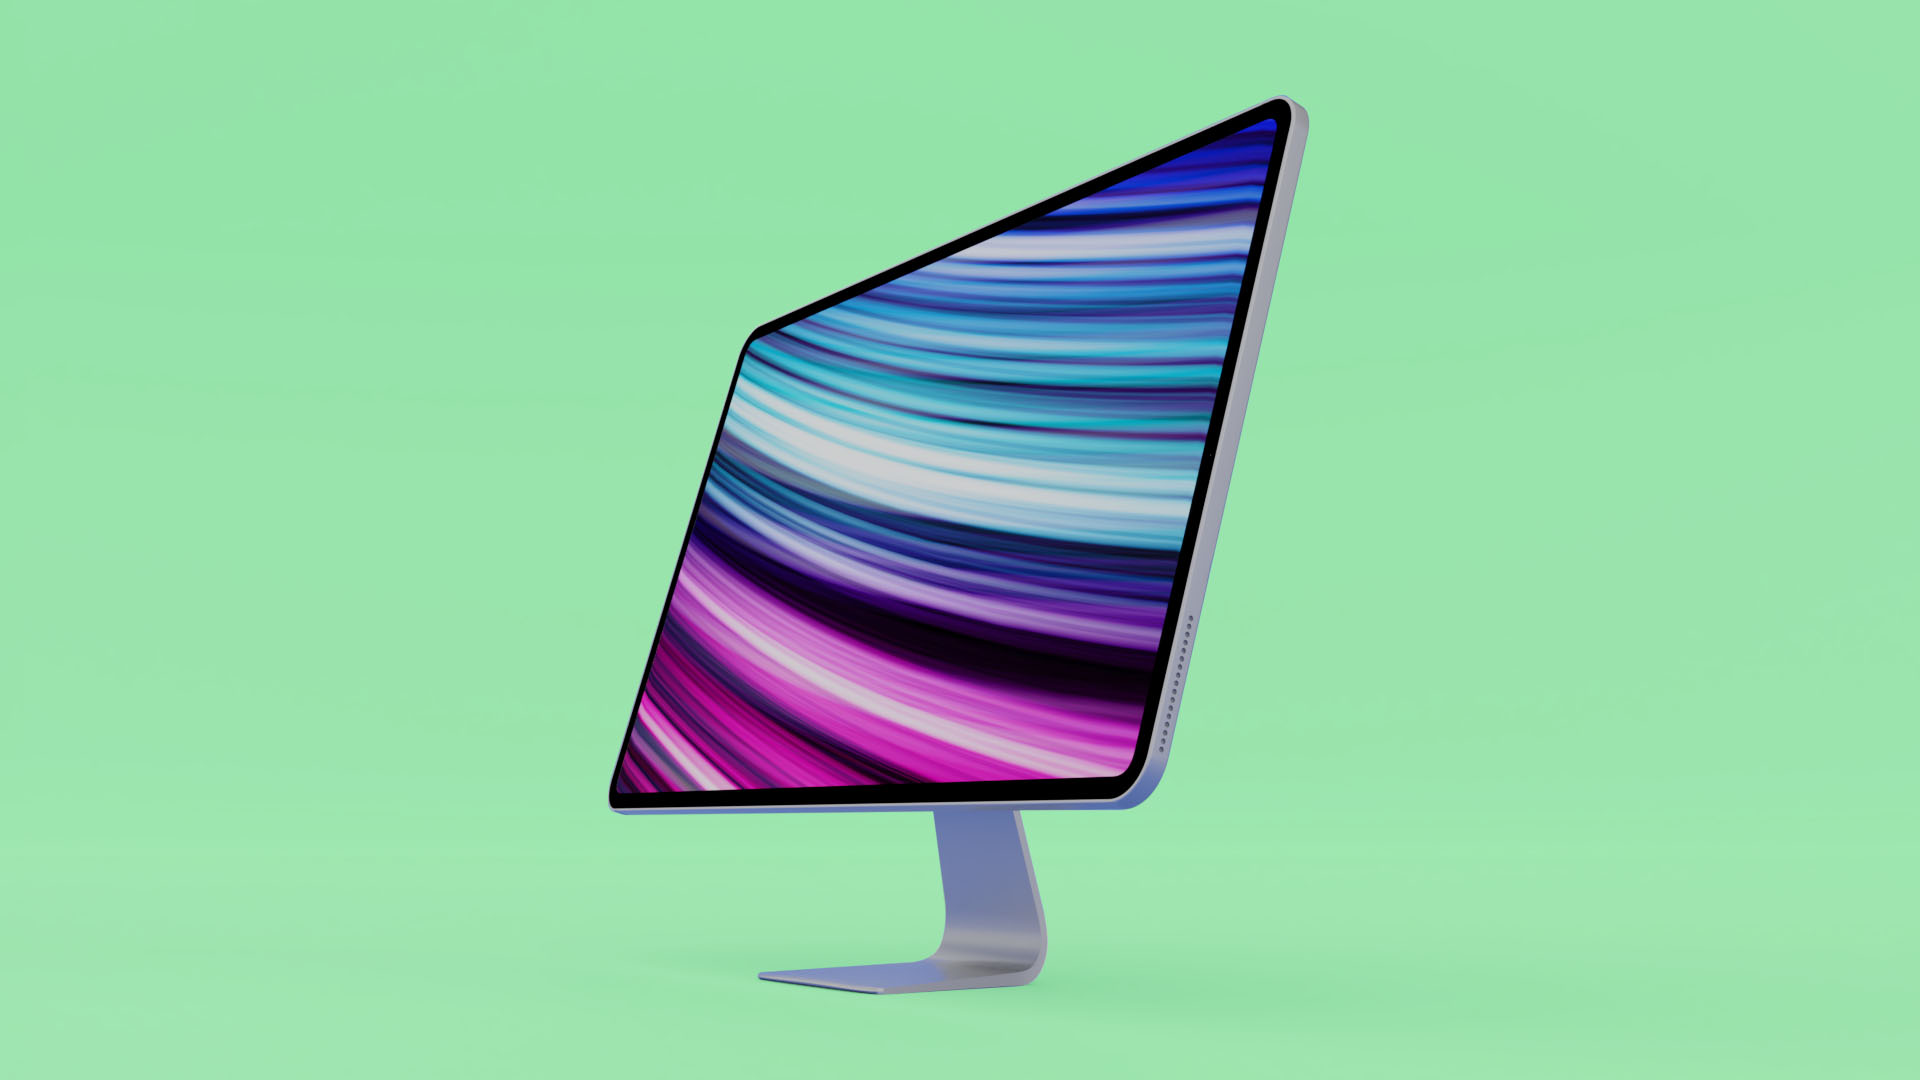 2020 iMac Mockup Feature teal